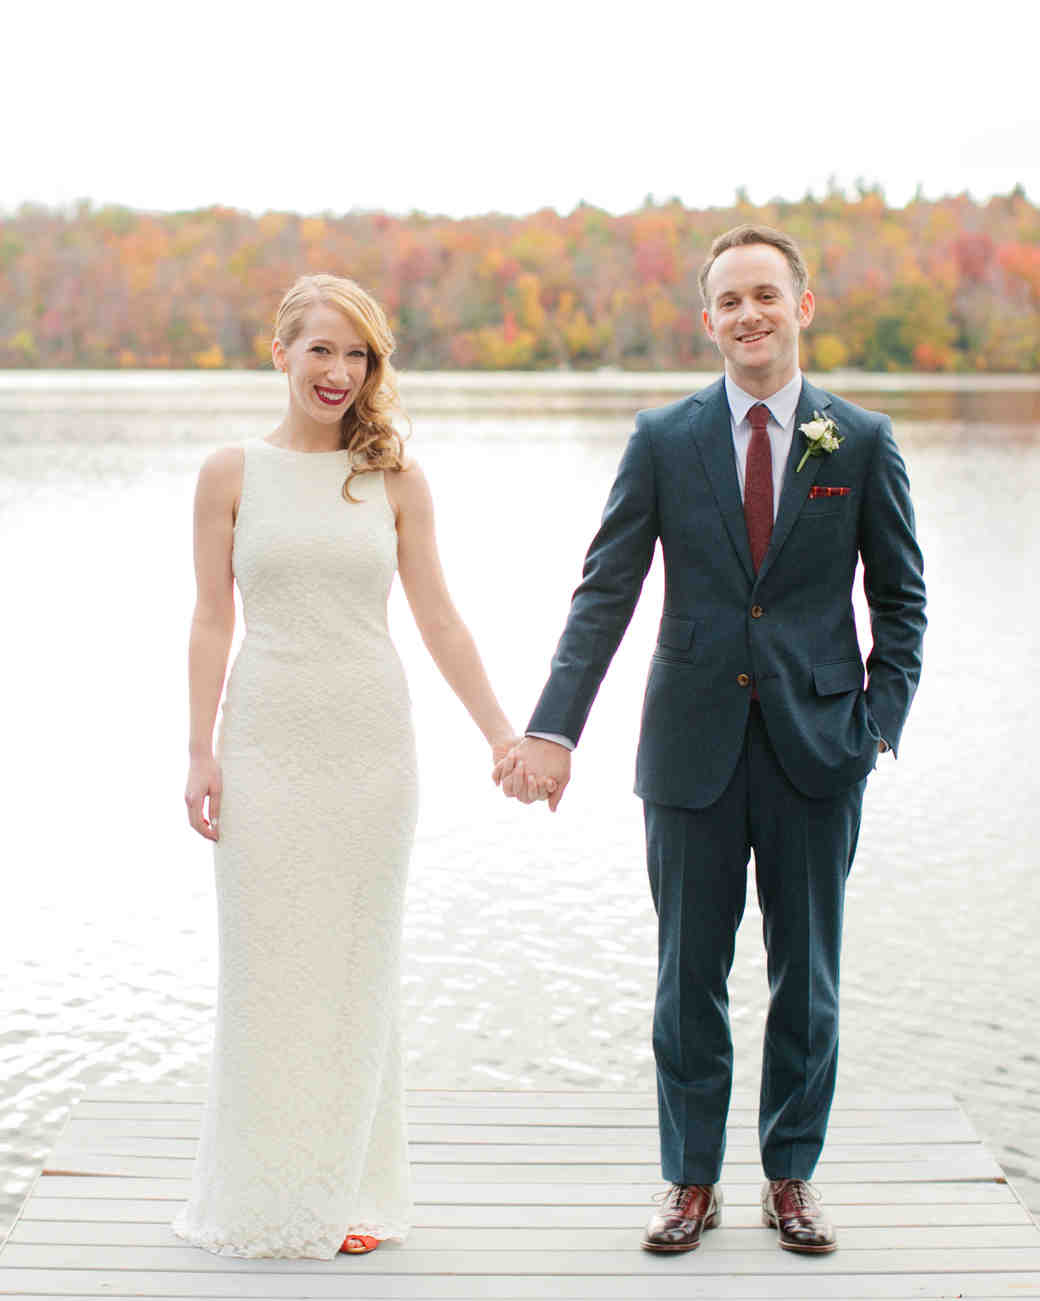 jess-steve-wedding-couple-119-s112362-1115.jpg